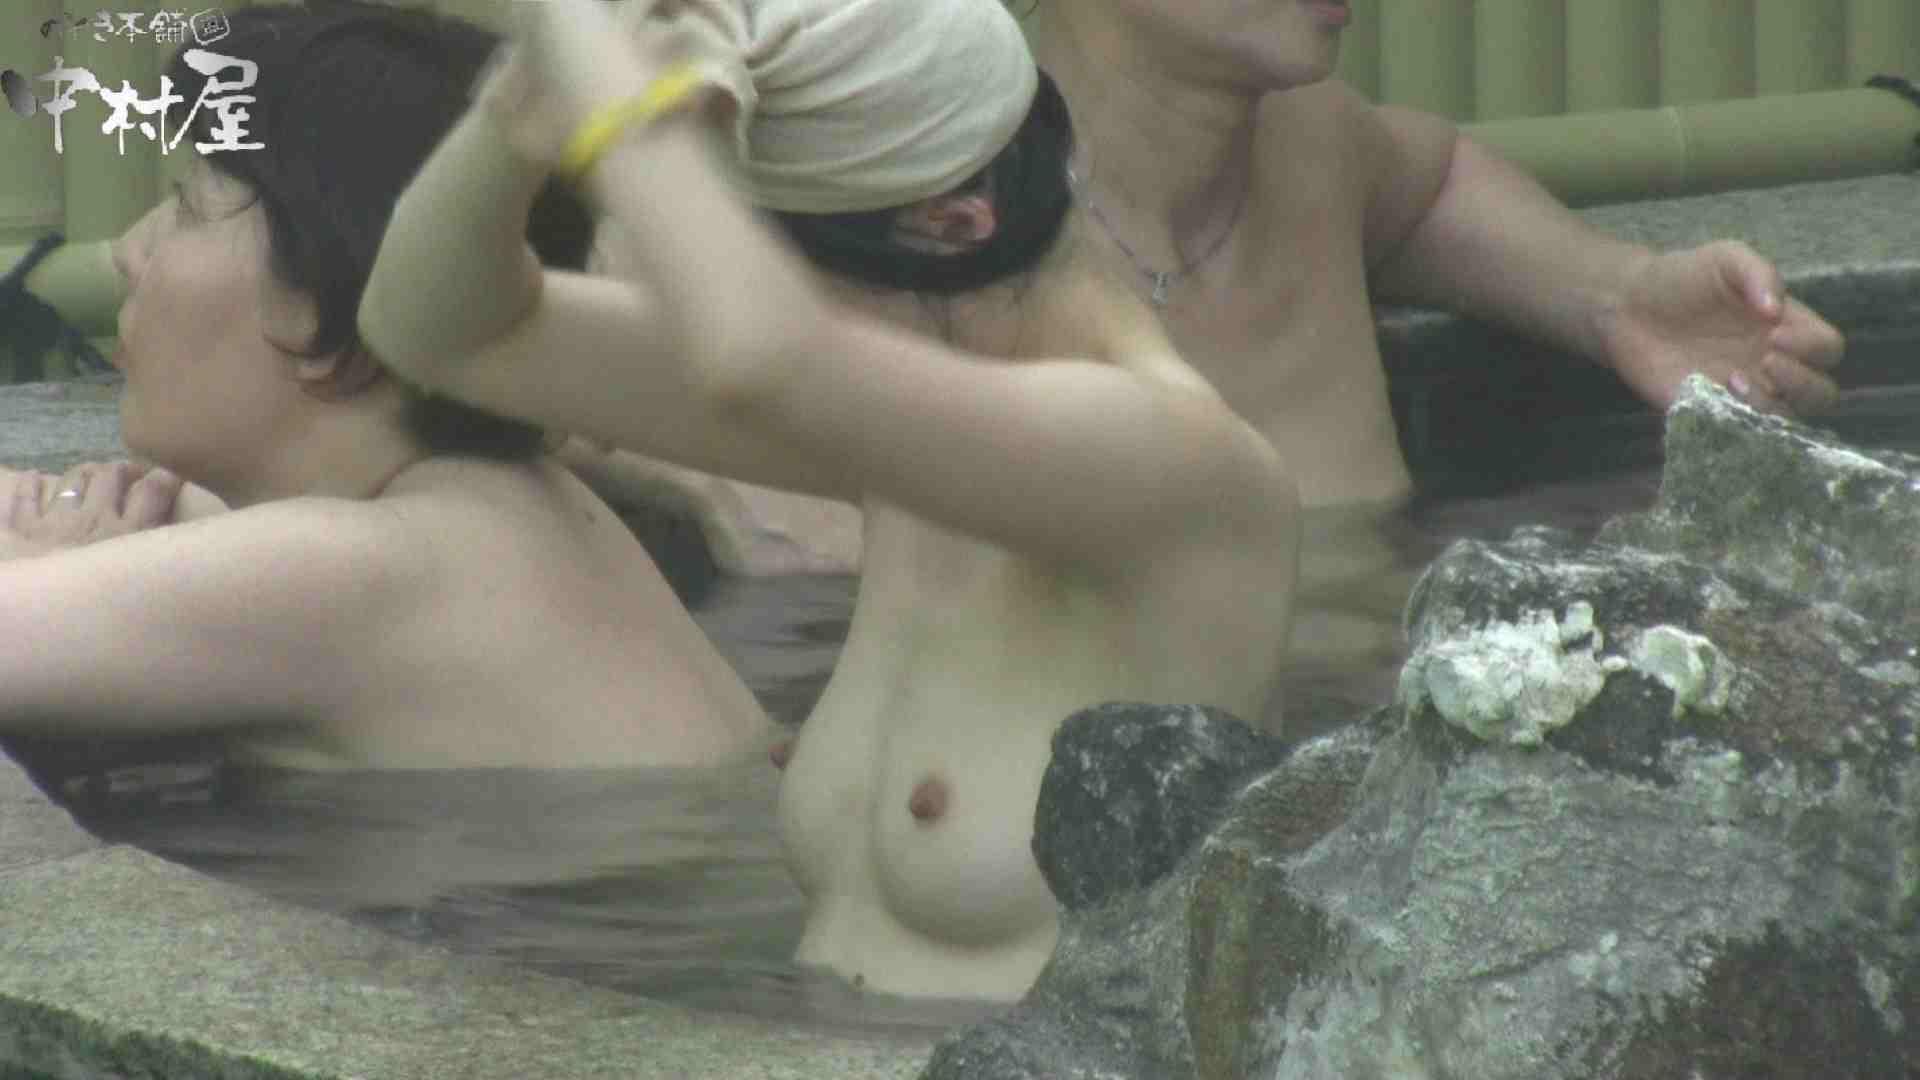 Aquaな露天風呂Vol.906 露天風呂編 | 盗撮シリーズ  86PIX 5